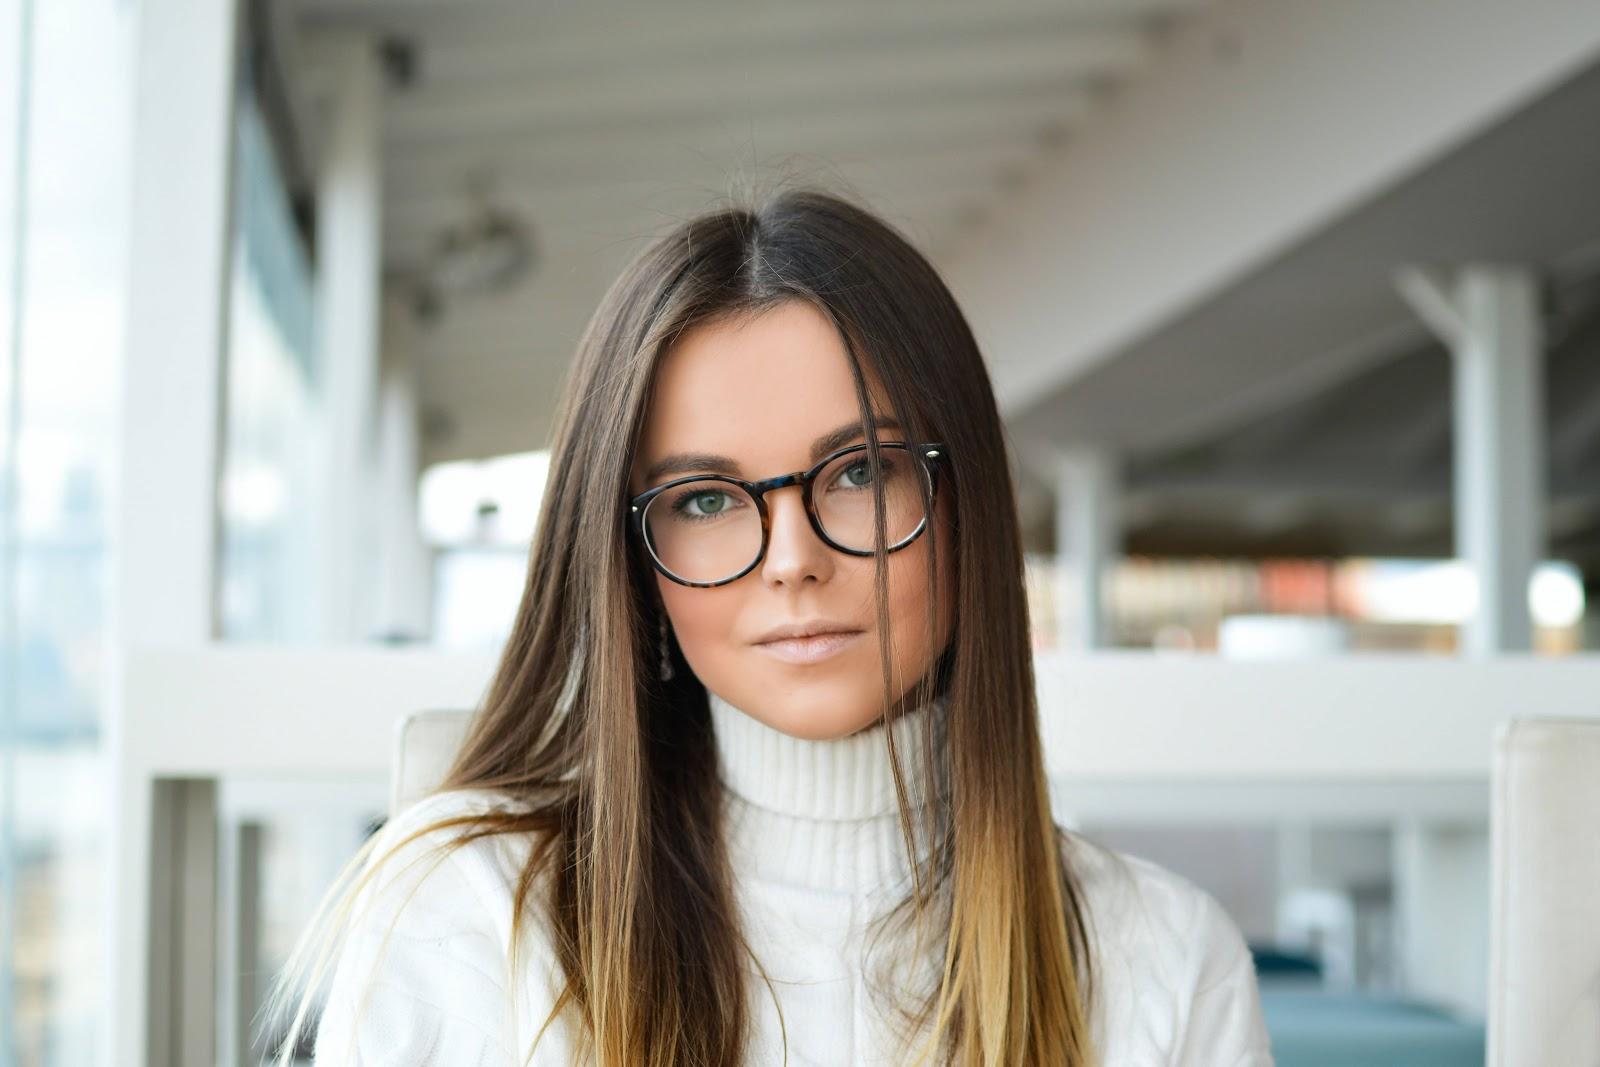 occhiali-da-vista-lentico